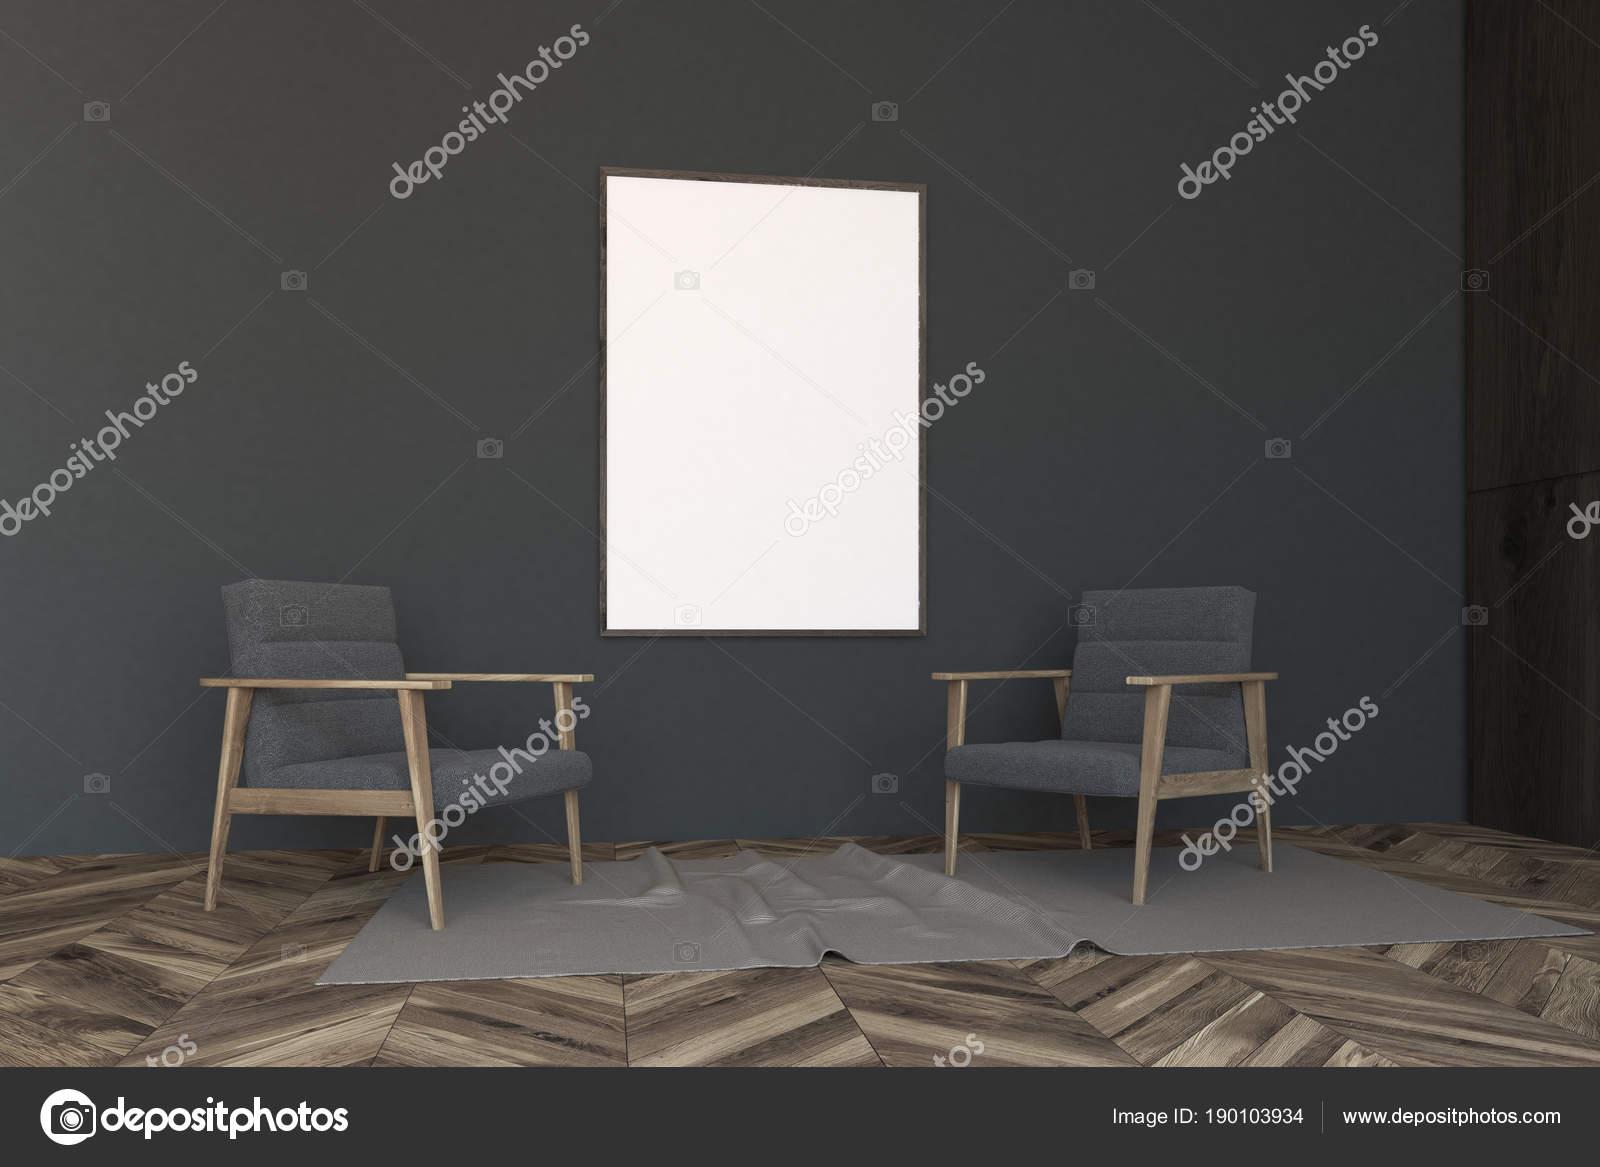 https://st3.depositphotos.com/2673929/19010/i/1600/depositphotos_190103934-stockafbeelding-grijs-woonkamer-grijze-fauteuils-poster.jpg